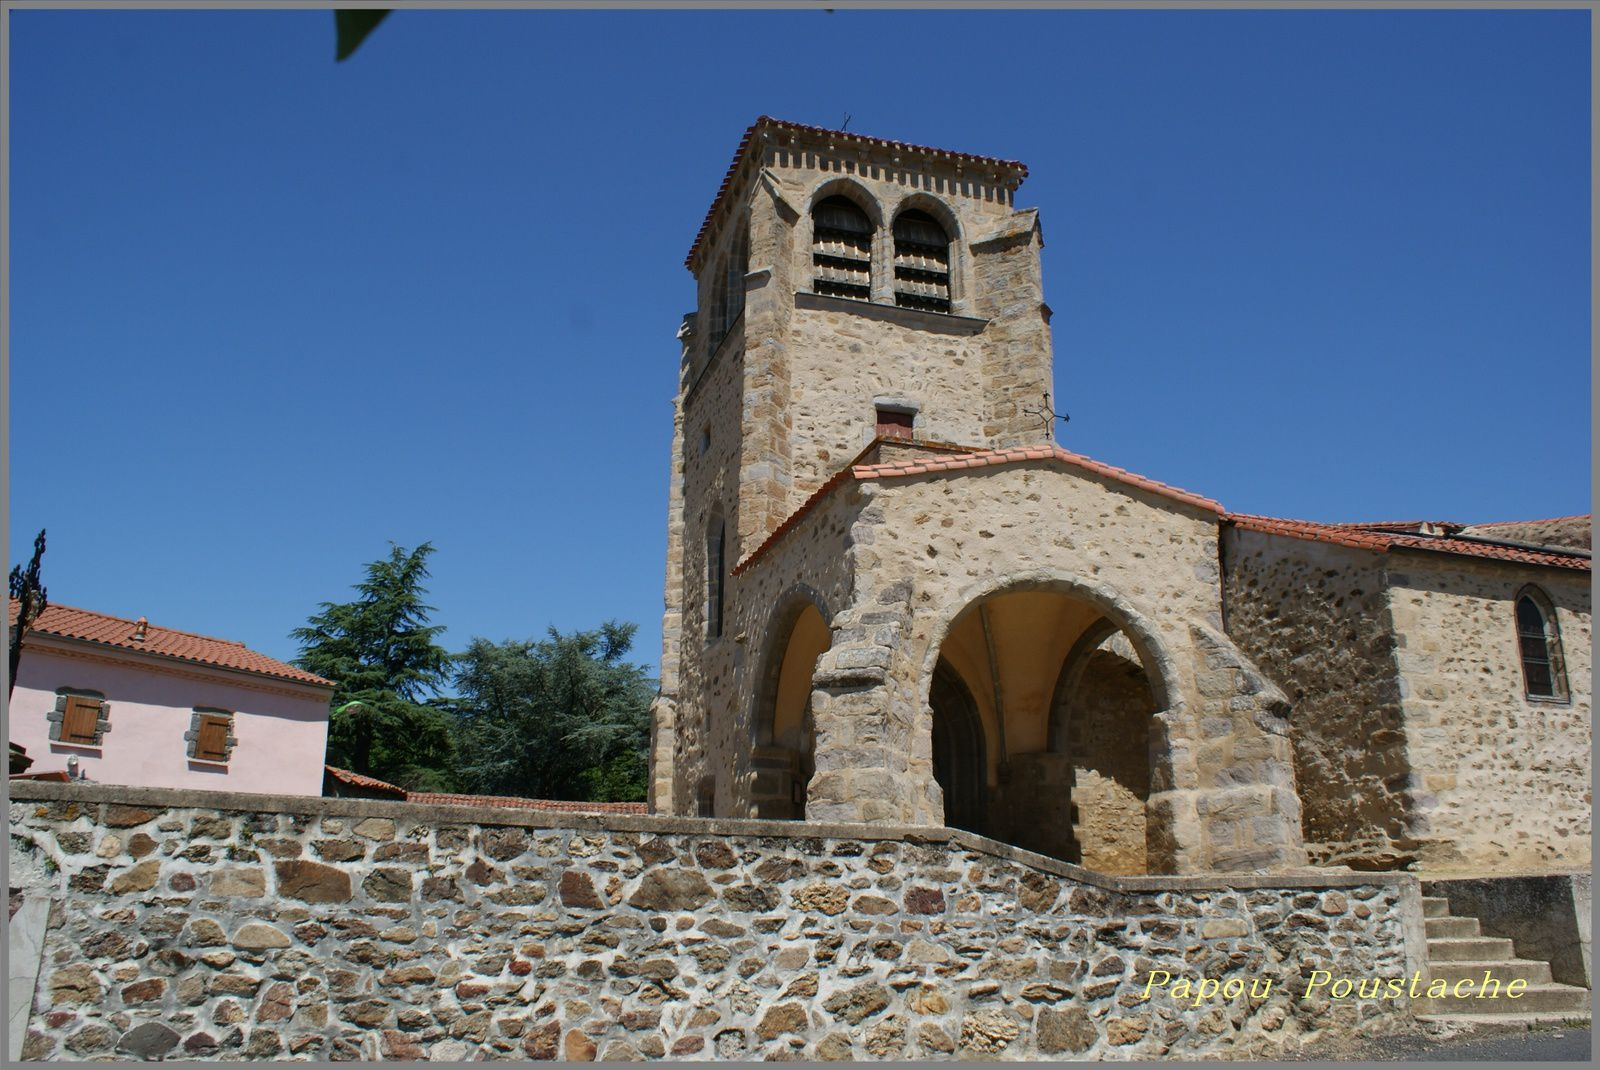 Eglise de Vézézoux